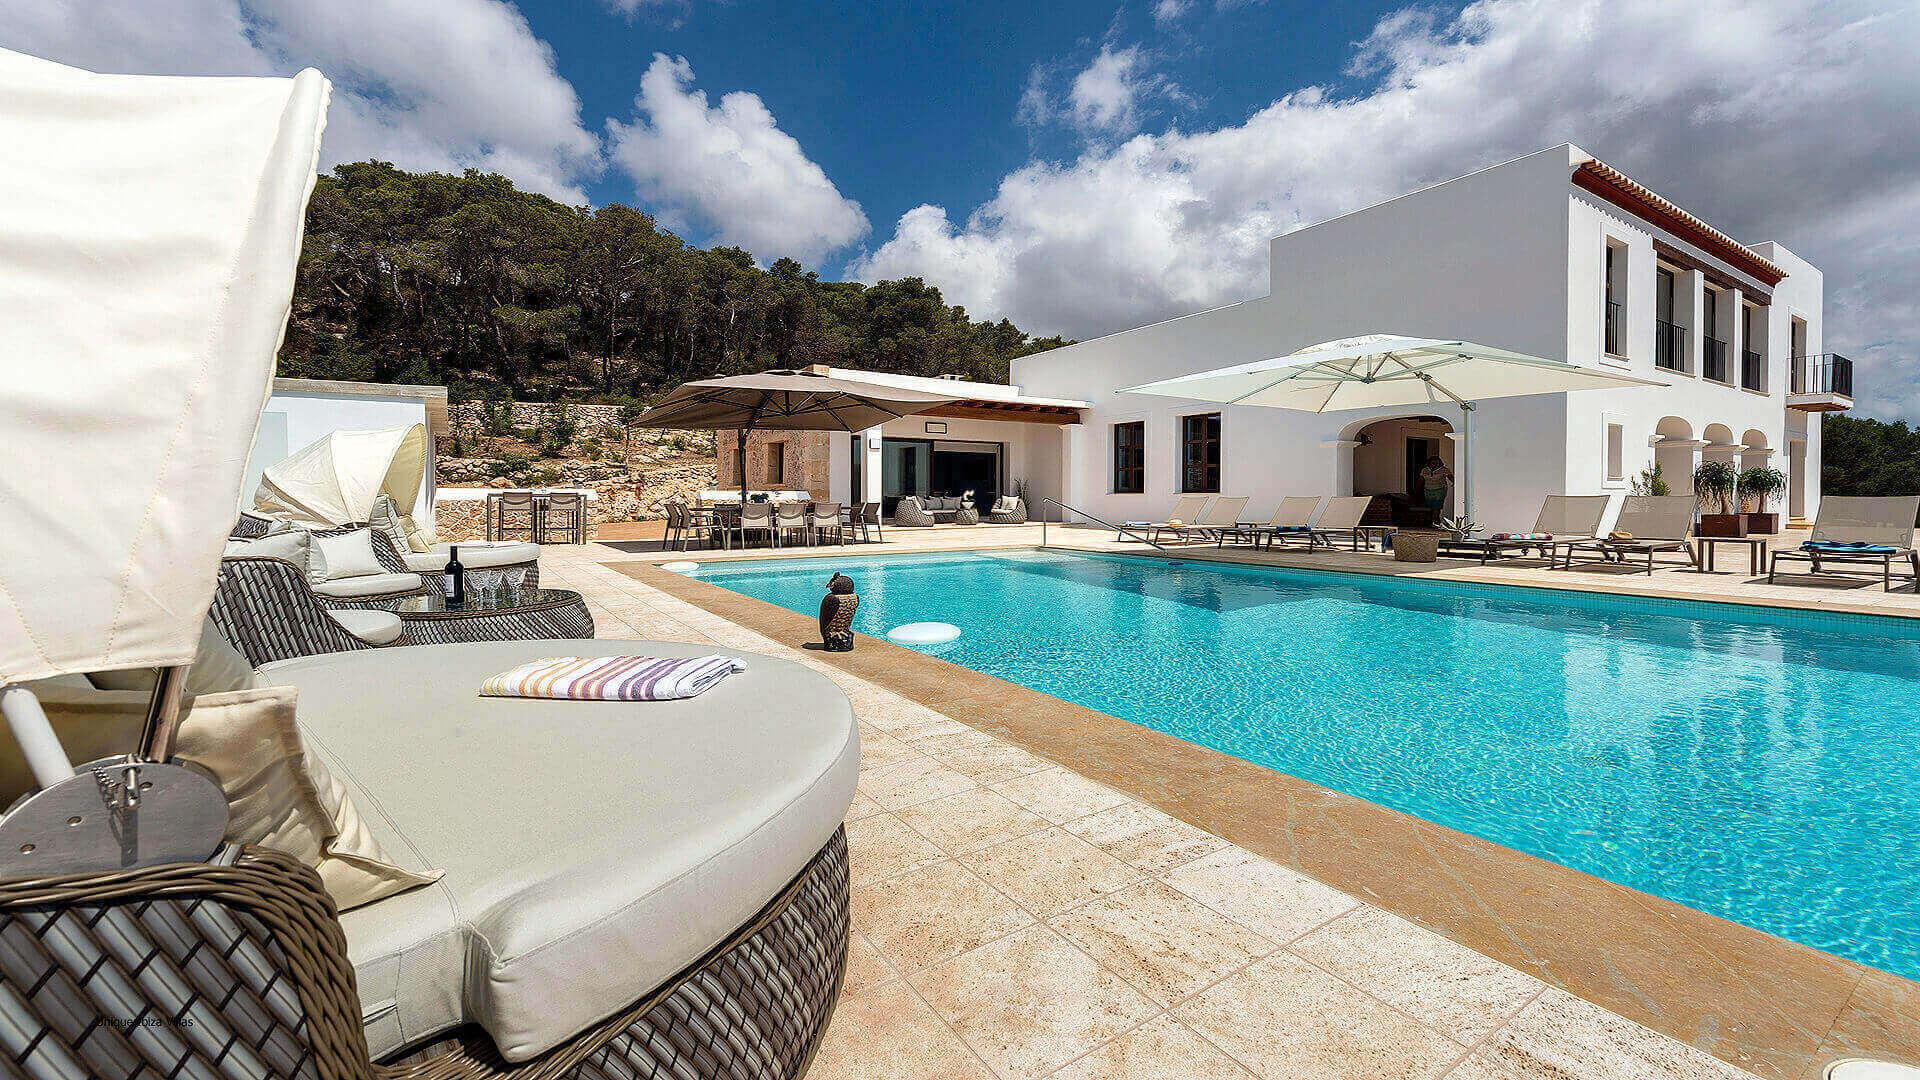 Casa Prats Ibiza 3 Santa Eulalia